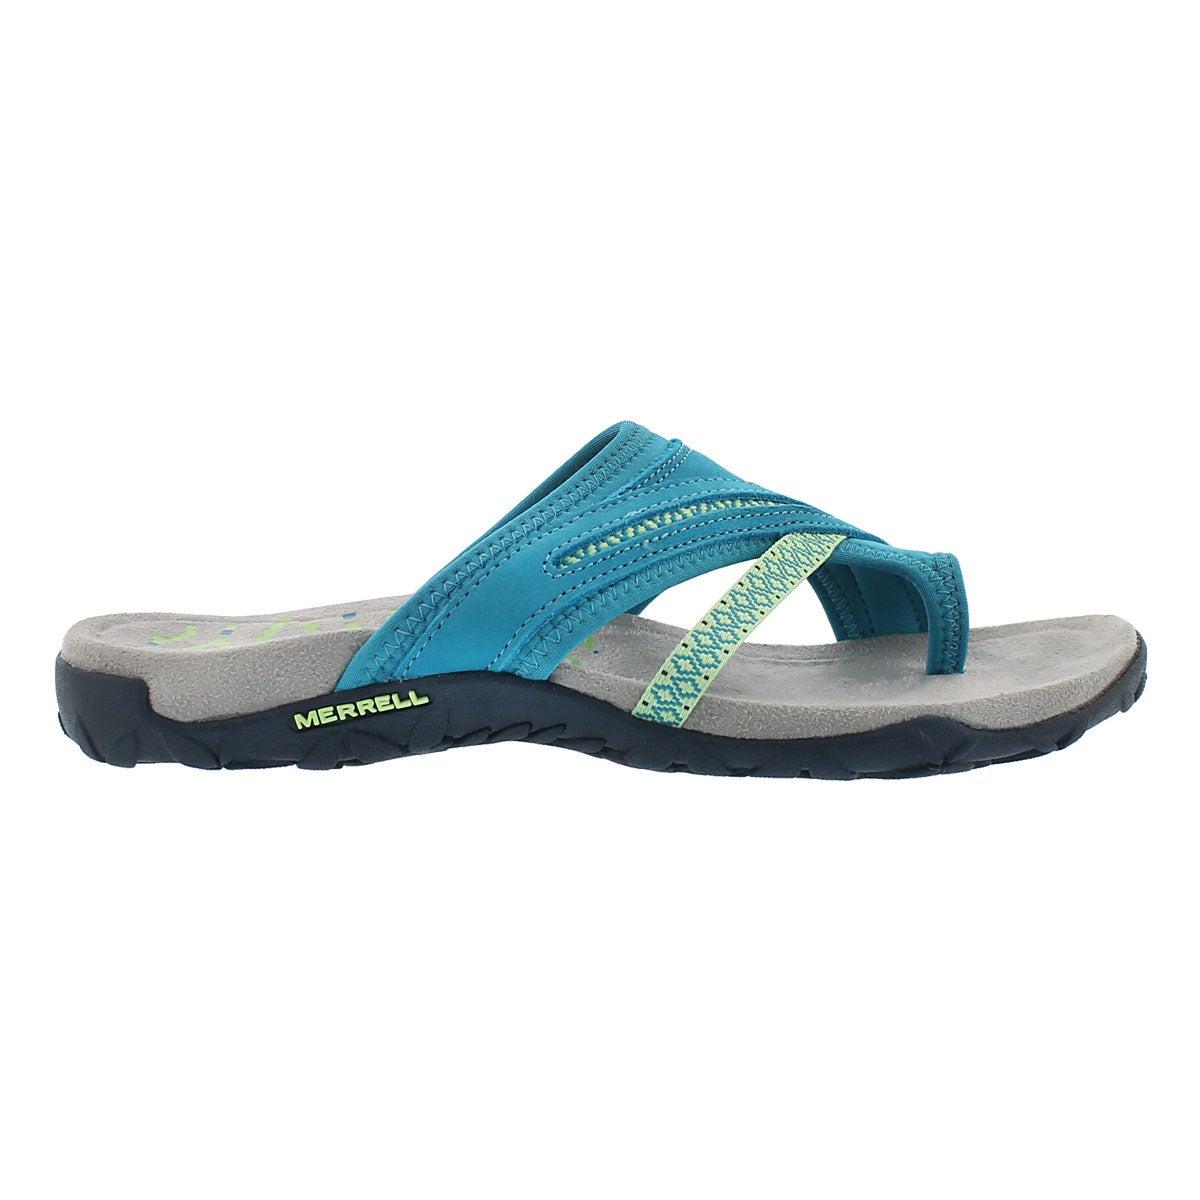 Lds Terran Post II teal toe wrap sandal